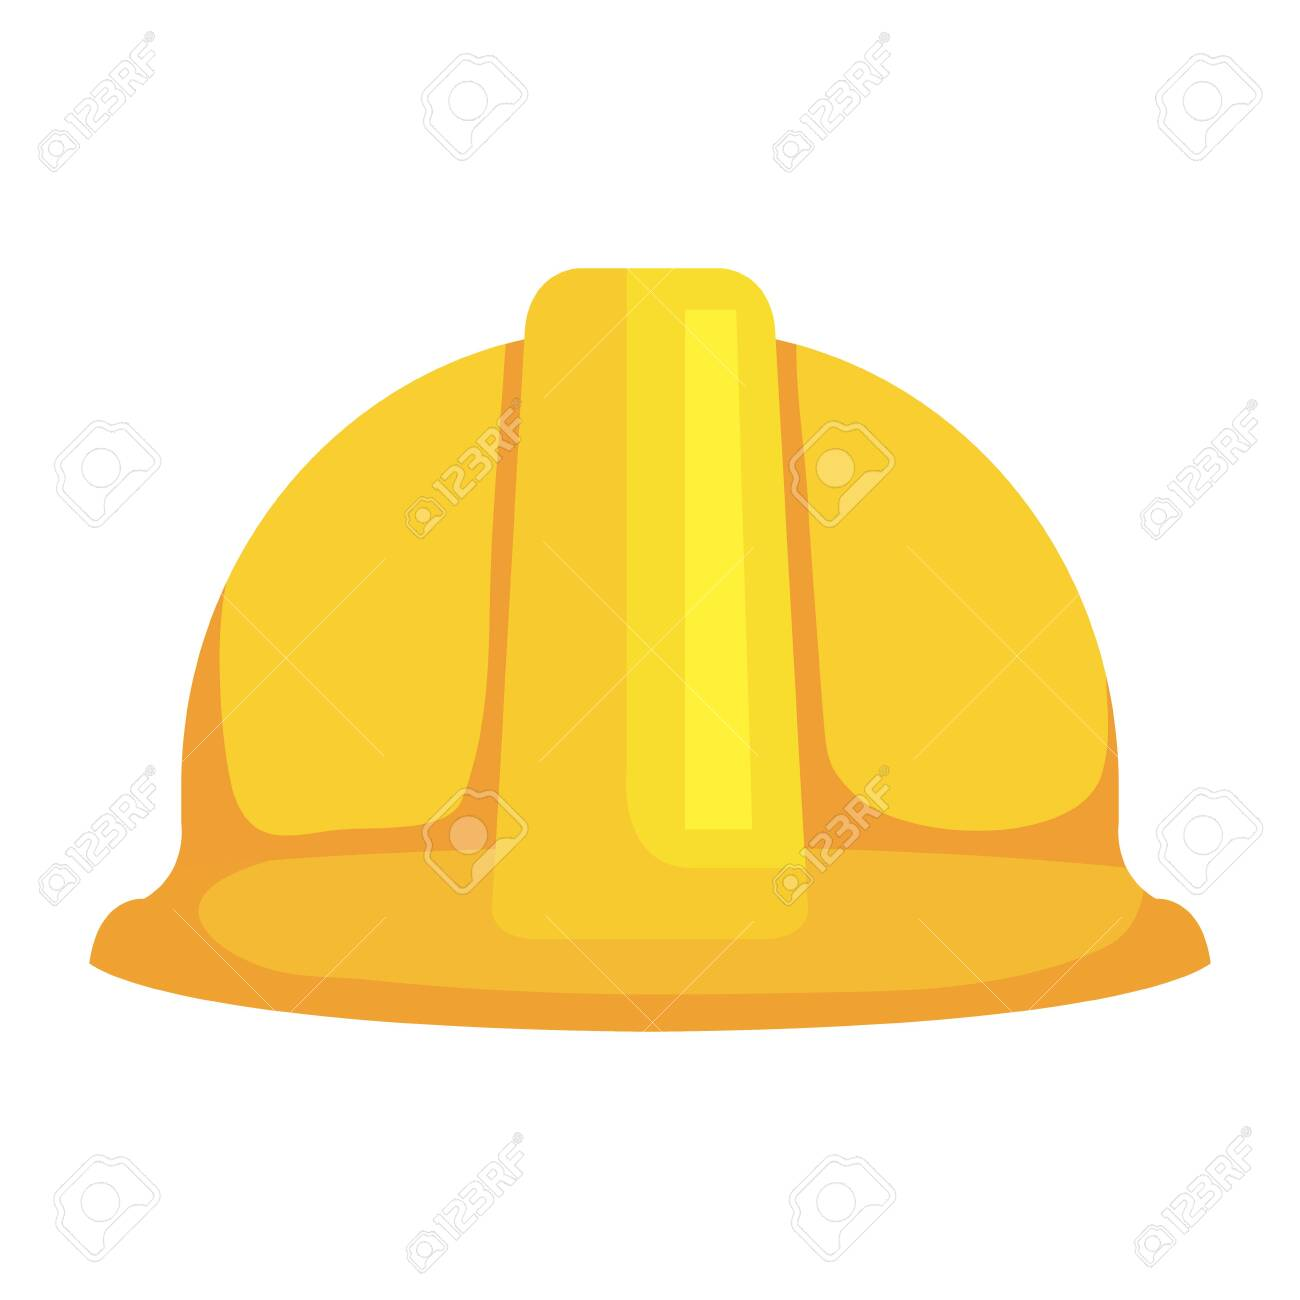 construction helmet protection icon vector illustration design - 129482507